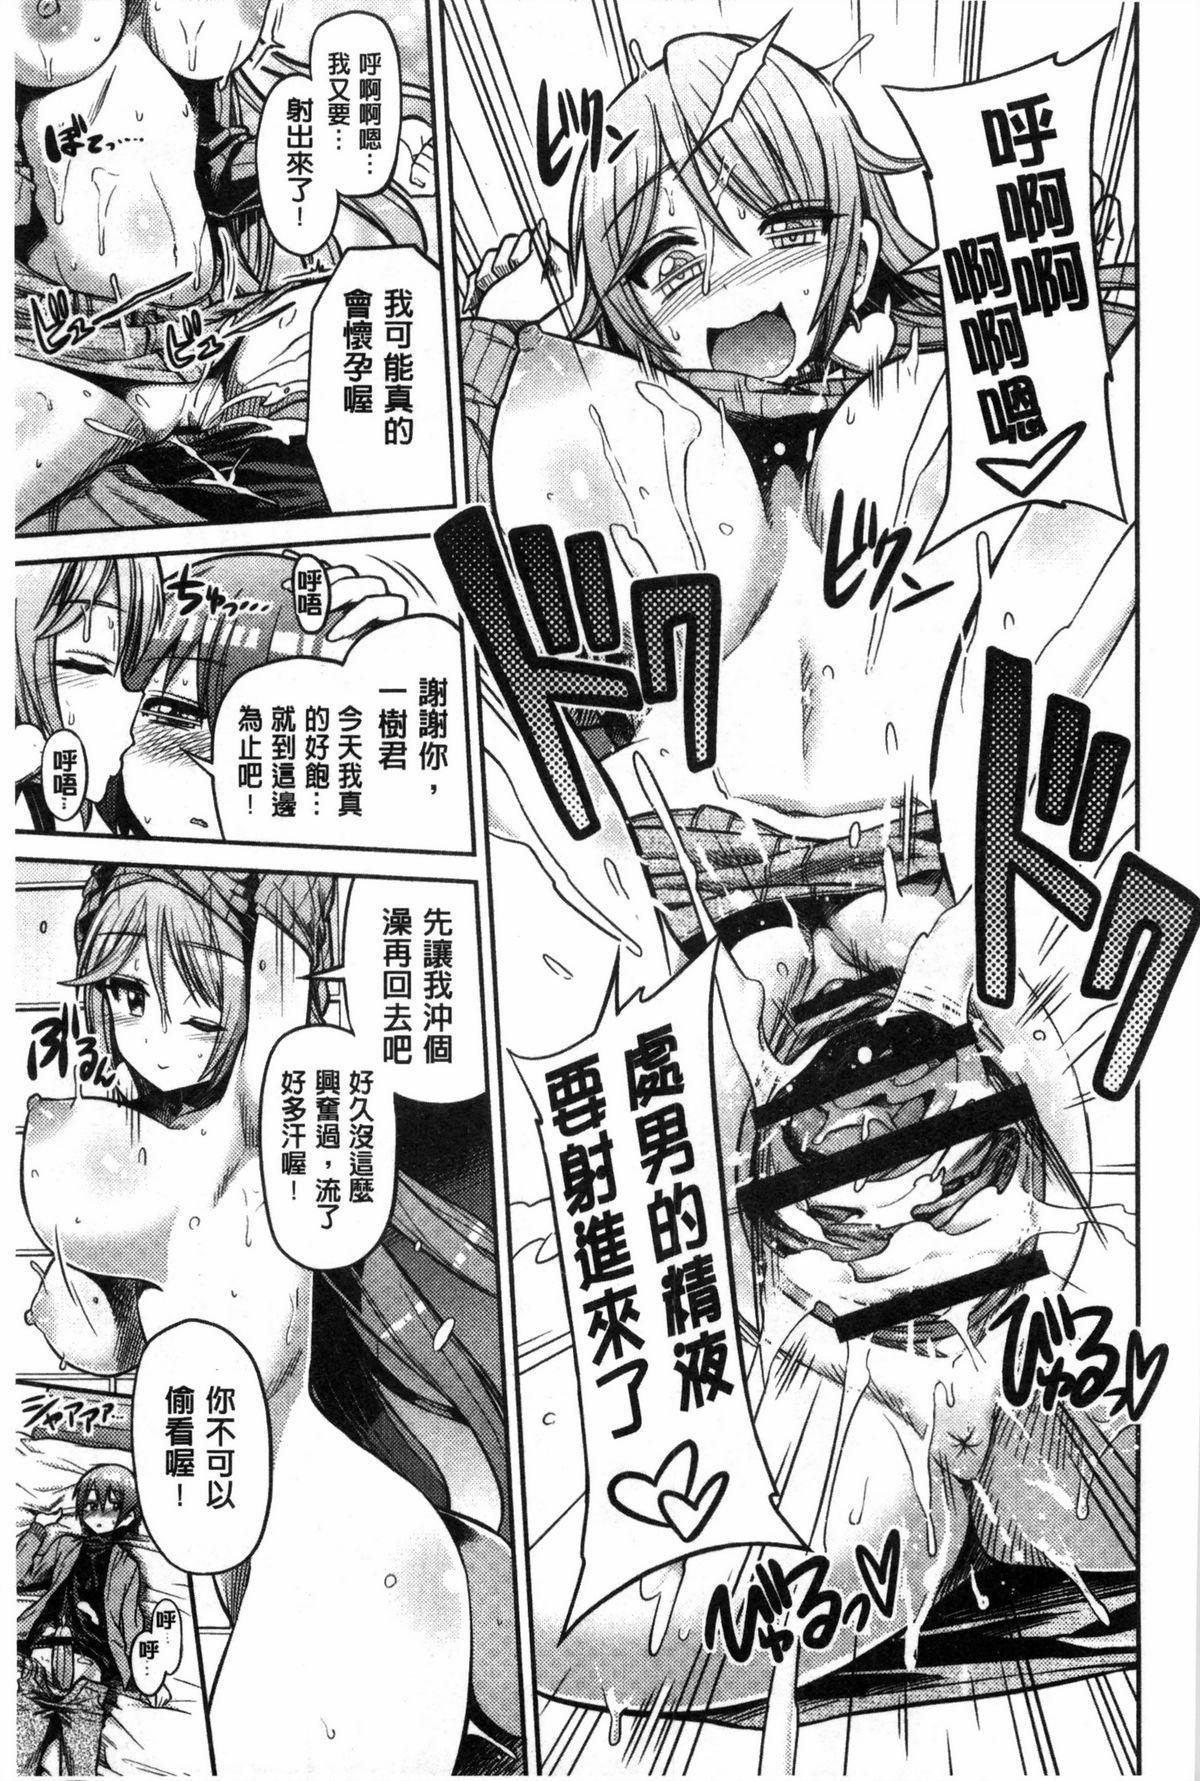 Man x Koi - Ero Manga de Hajimaru Koi no Plot   A漫×戀情 由情色漫畫所萌生的戀之物語 127